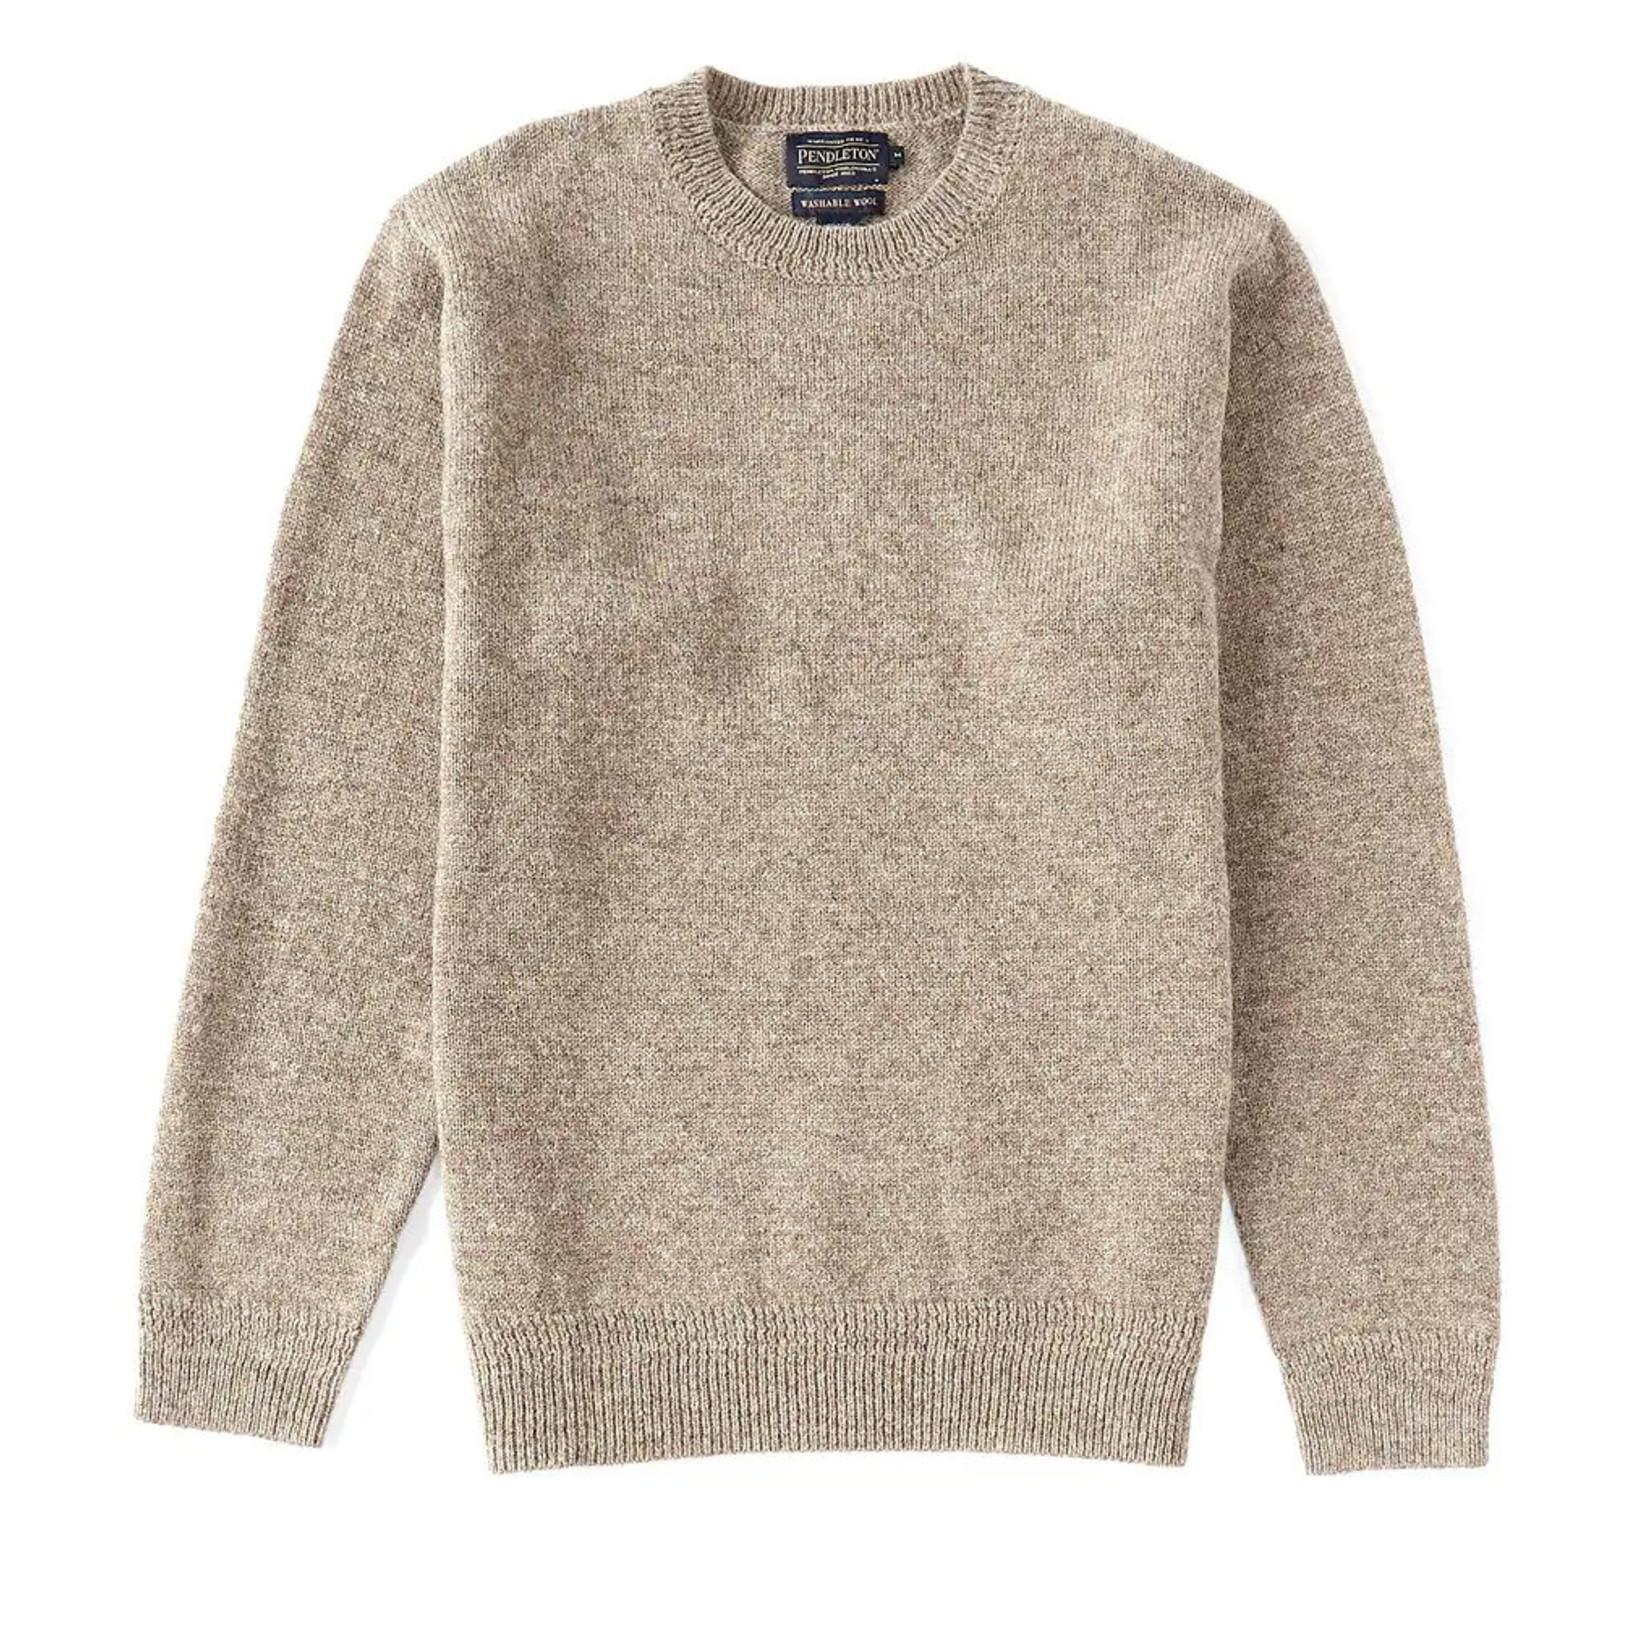 Pendleton Pendleton Shetland Crew Sweater RF532-61484